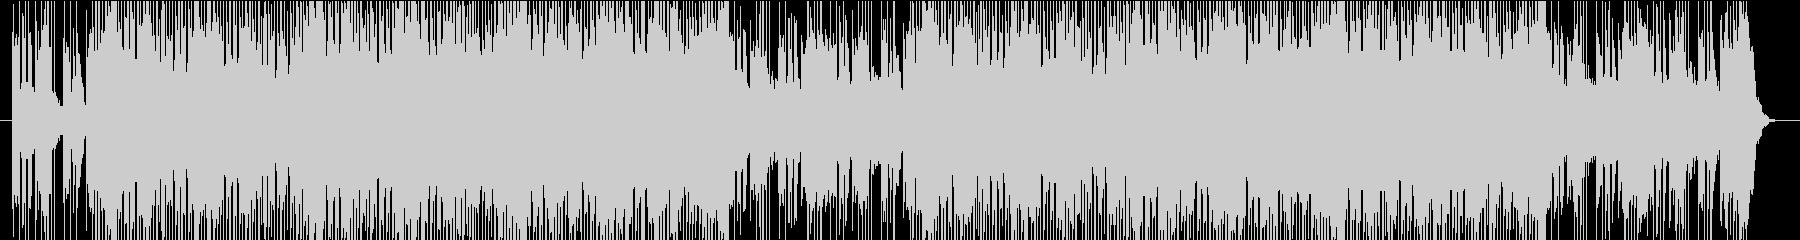 Pop's unreproduced waveform